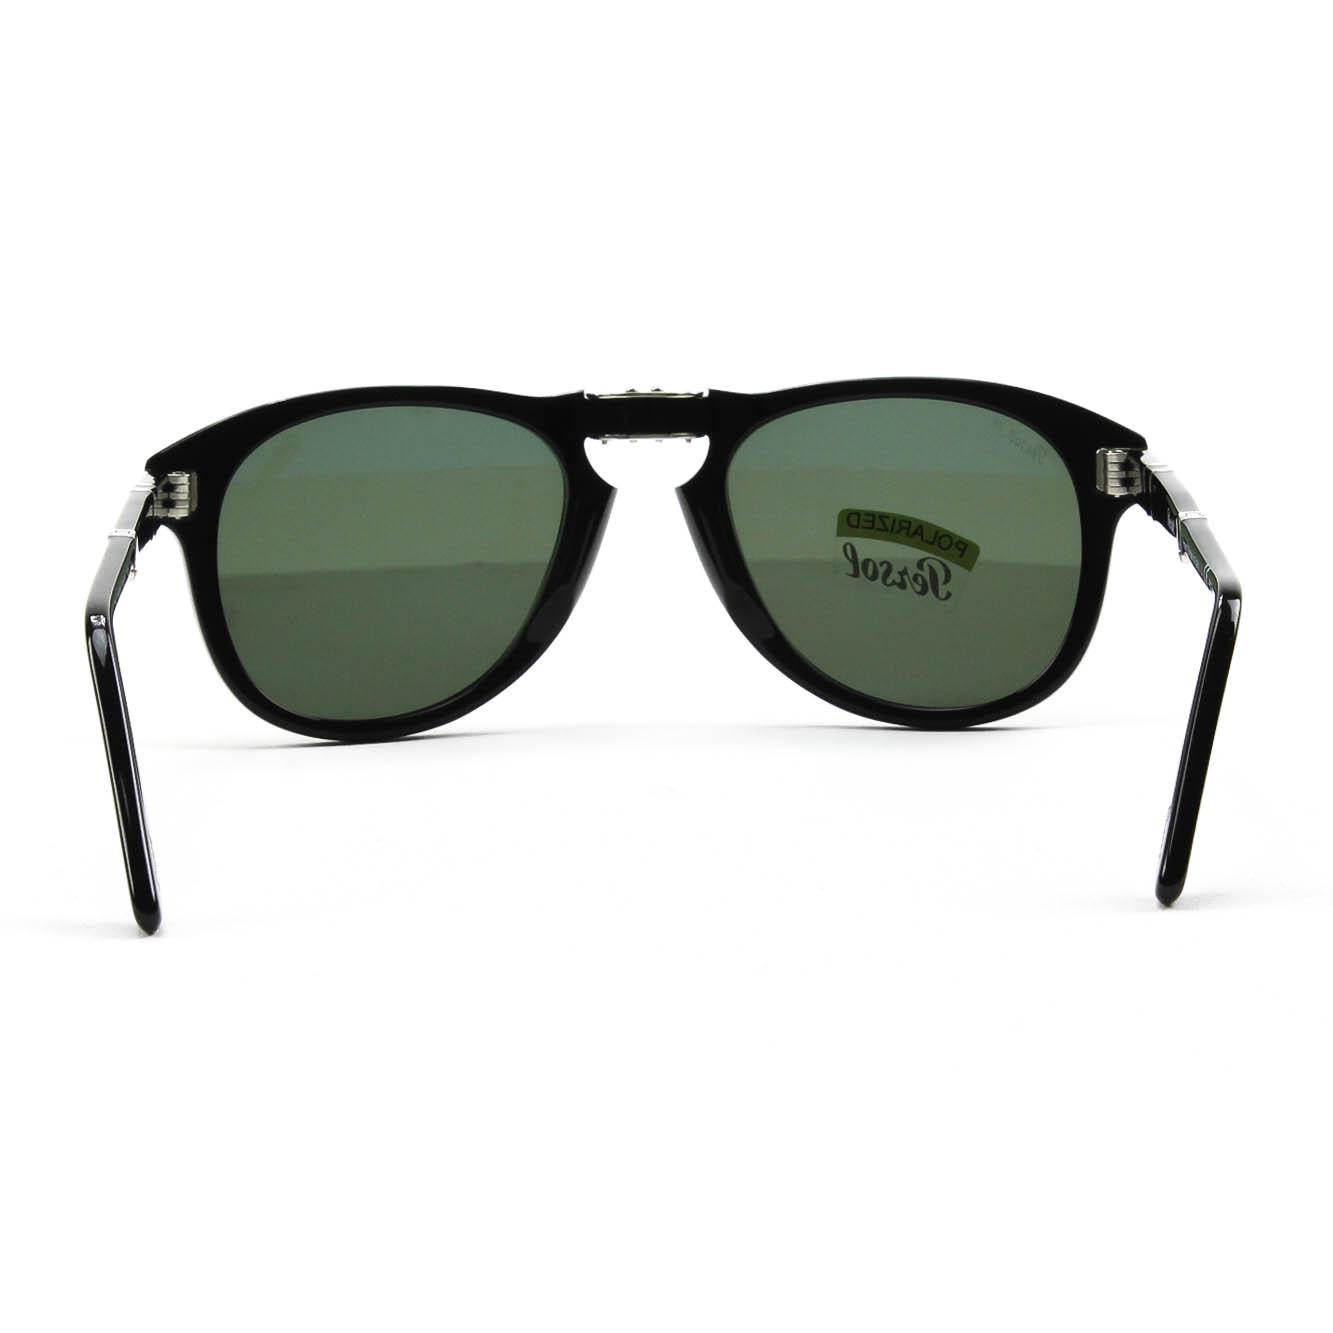 Persol 714 Folding Sunglasses 95/58 Black Grey Green Polarized Lens PO0714 52 mm | eBay